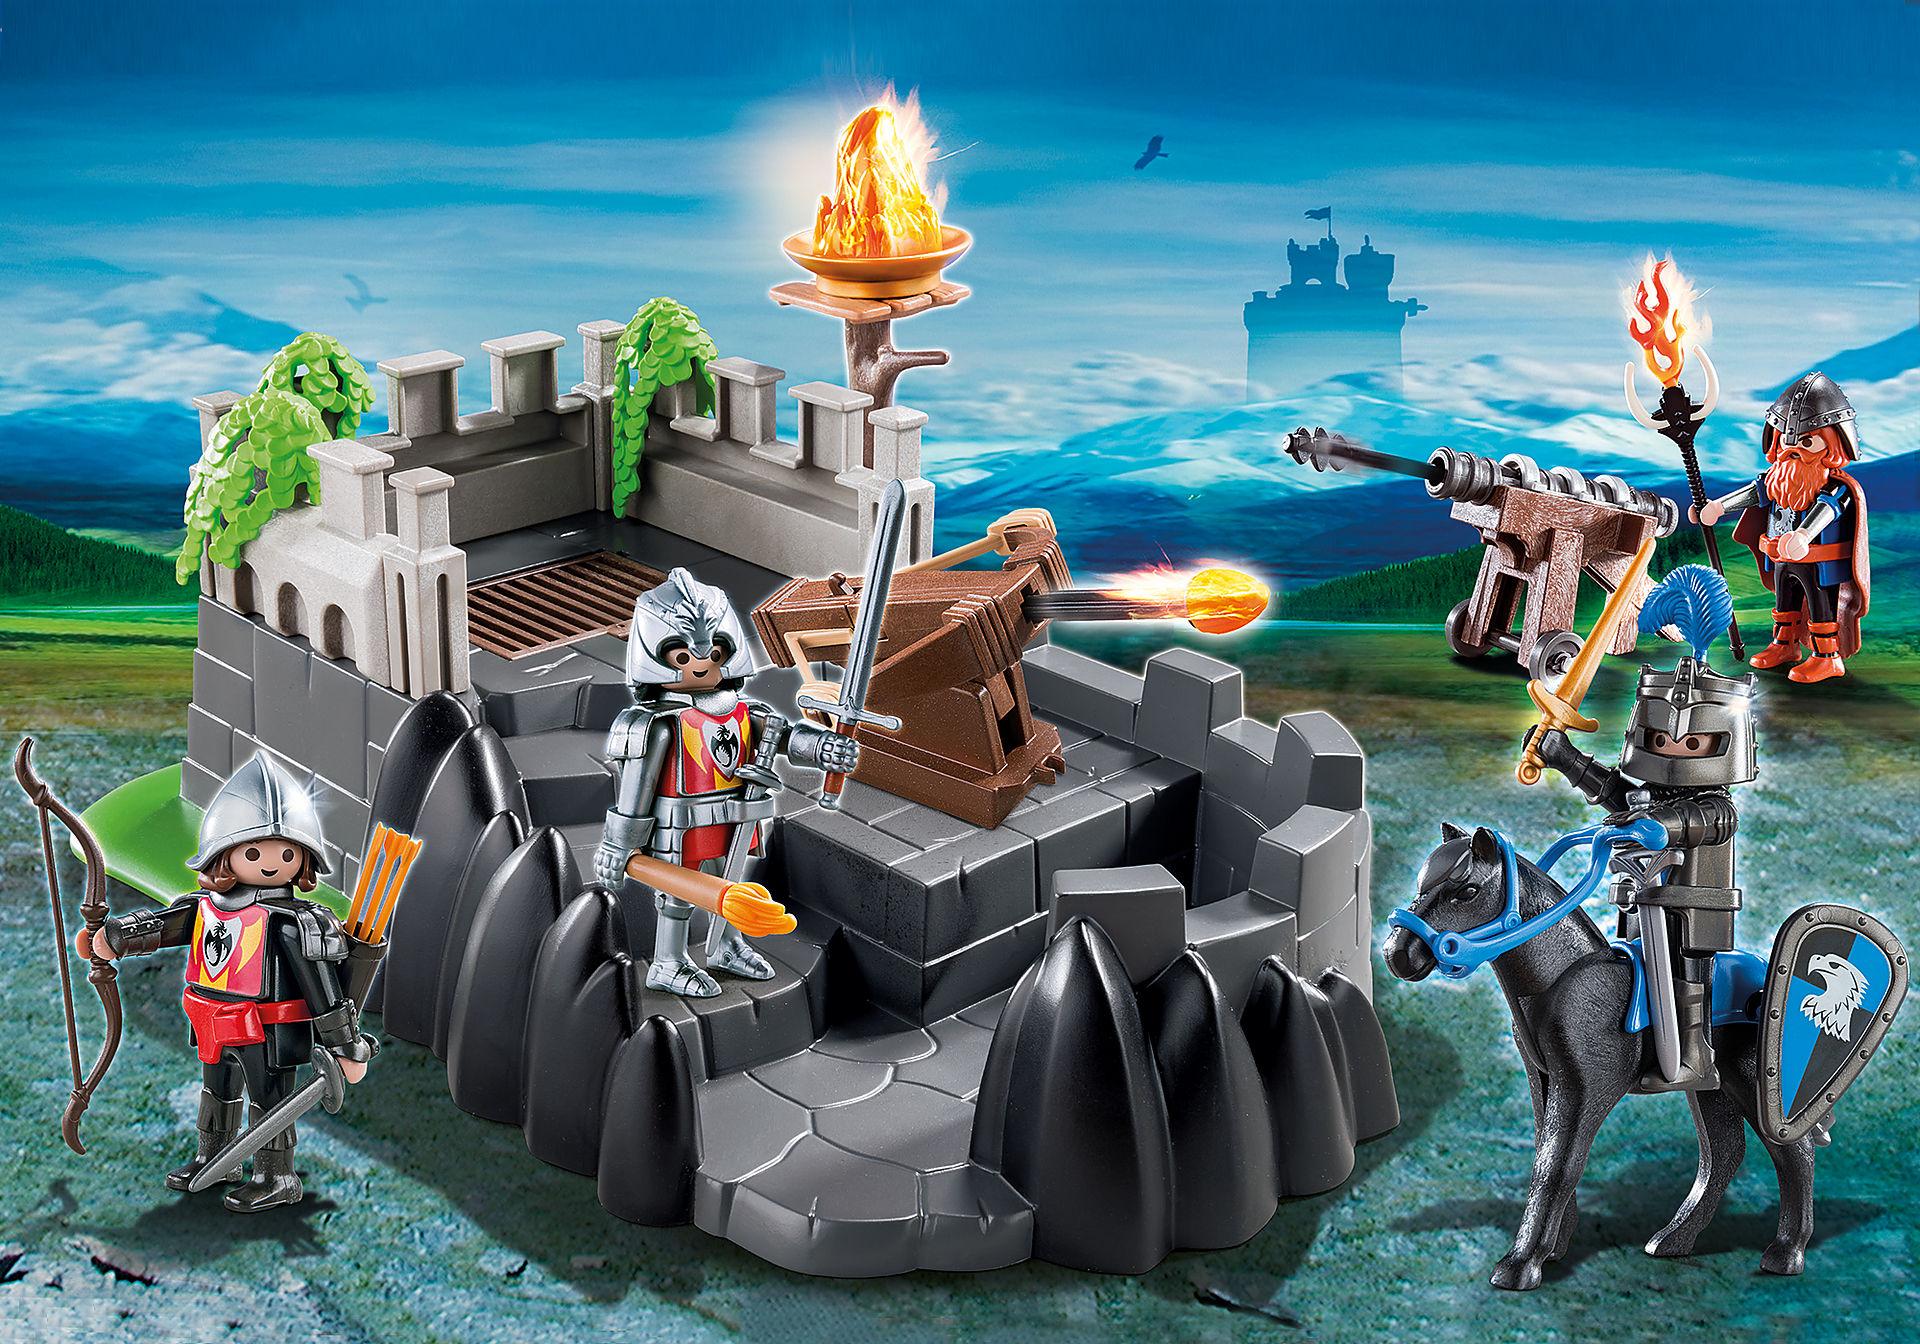 http://media.playmobil.com/i/playmobil/6627_product_detail/Dragon Knights' Fort